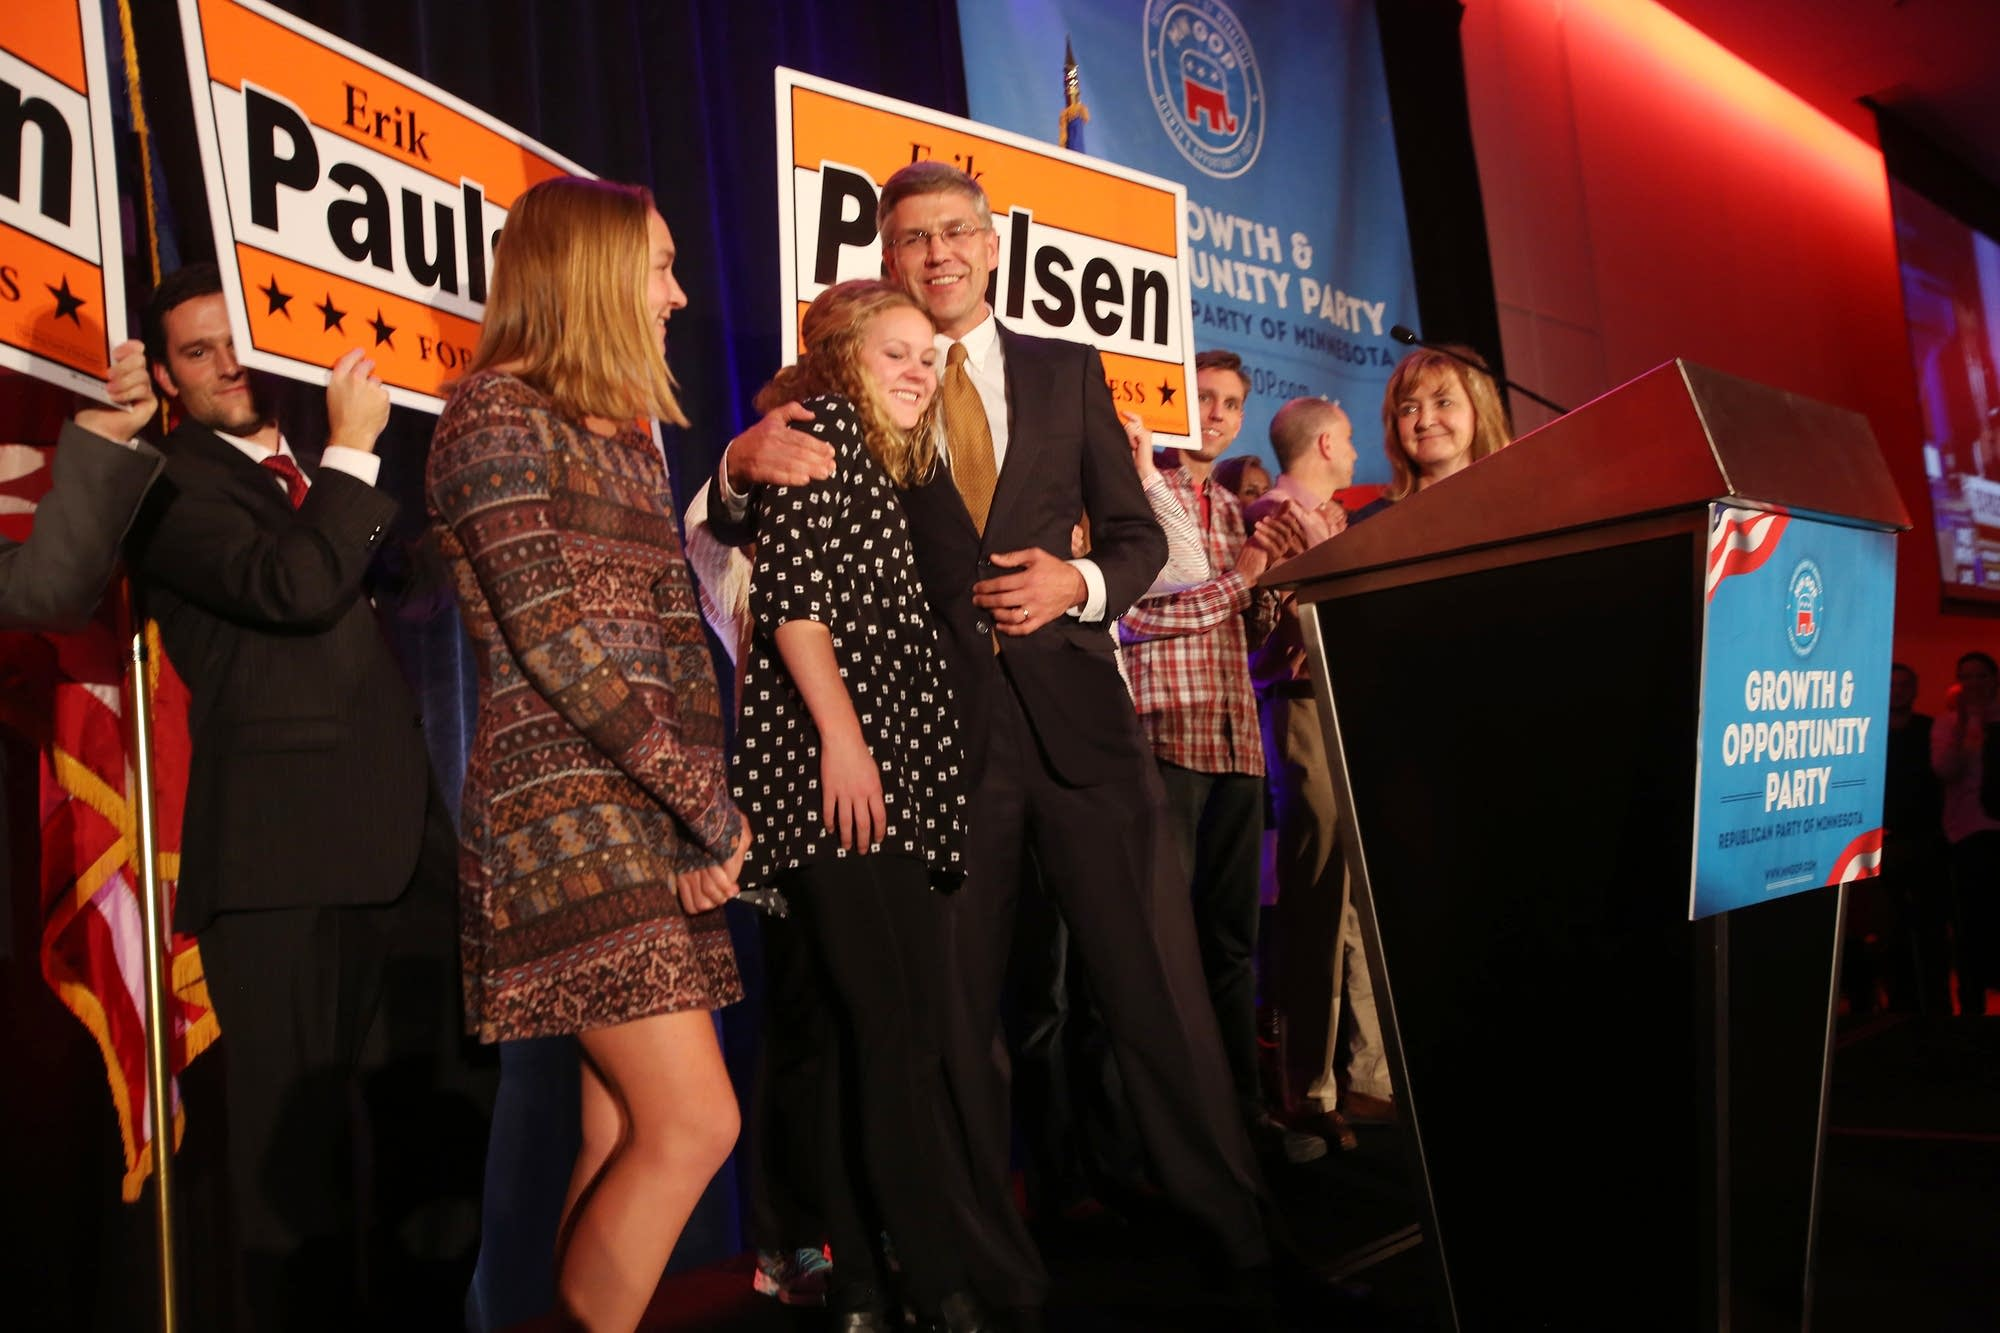 Paulsen celebrates his win.